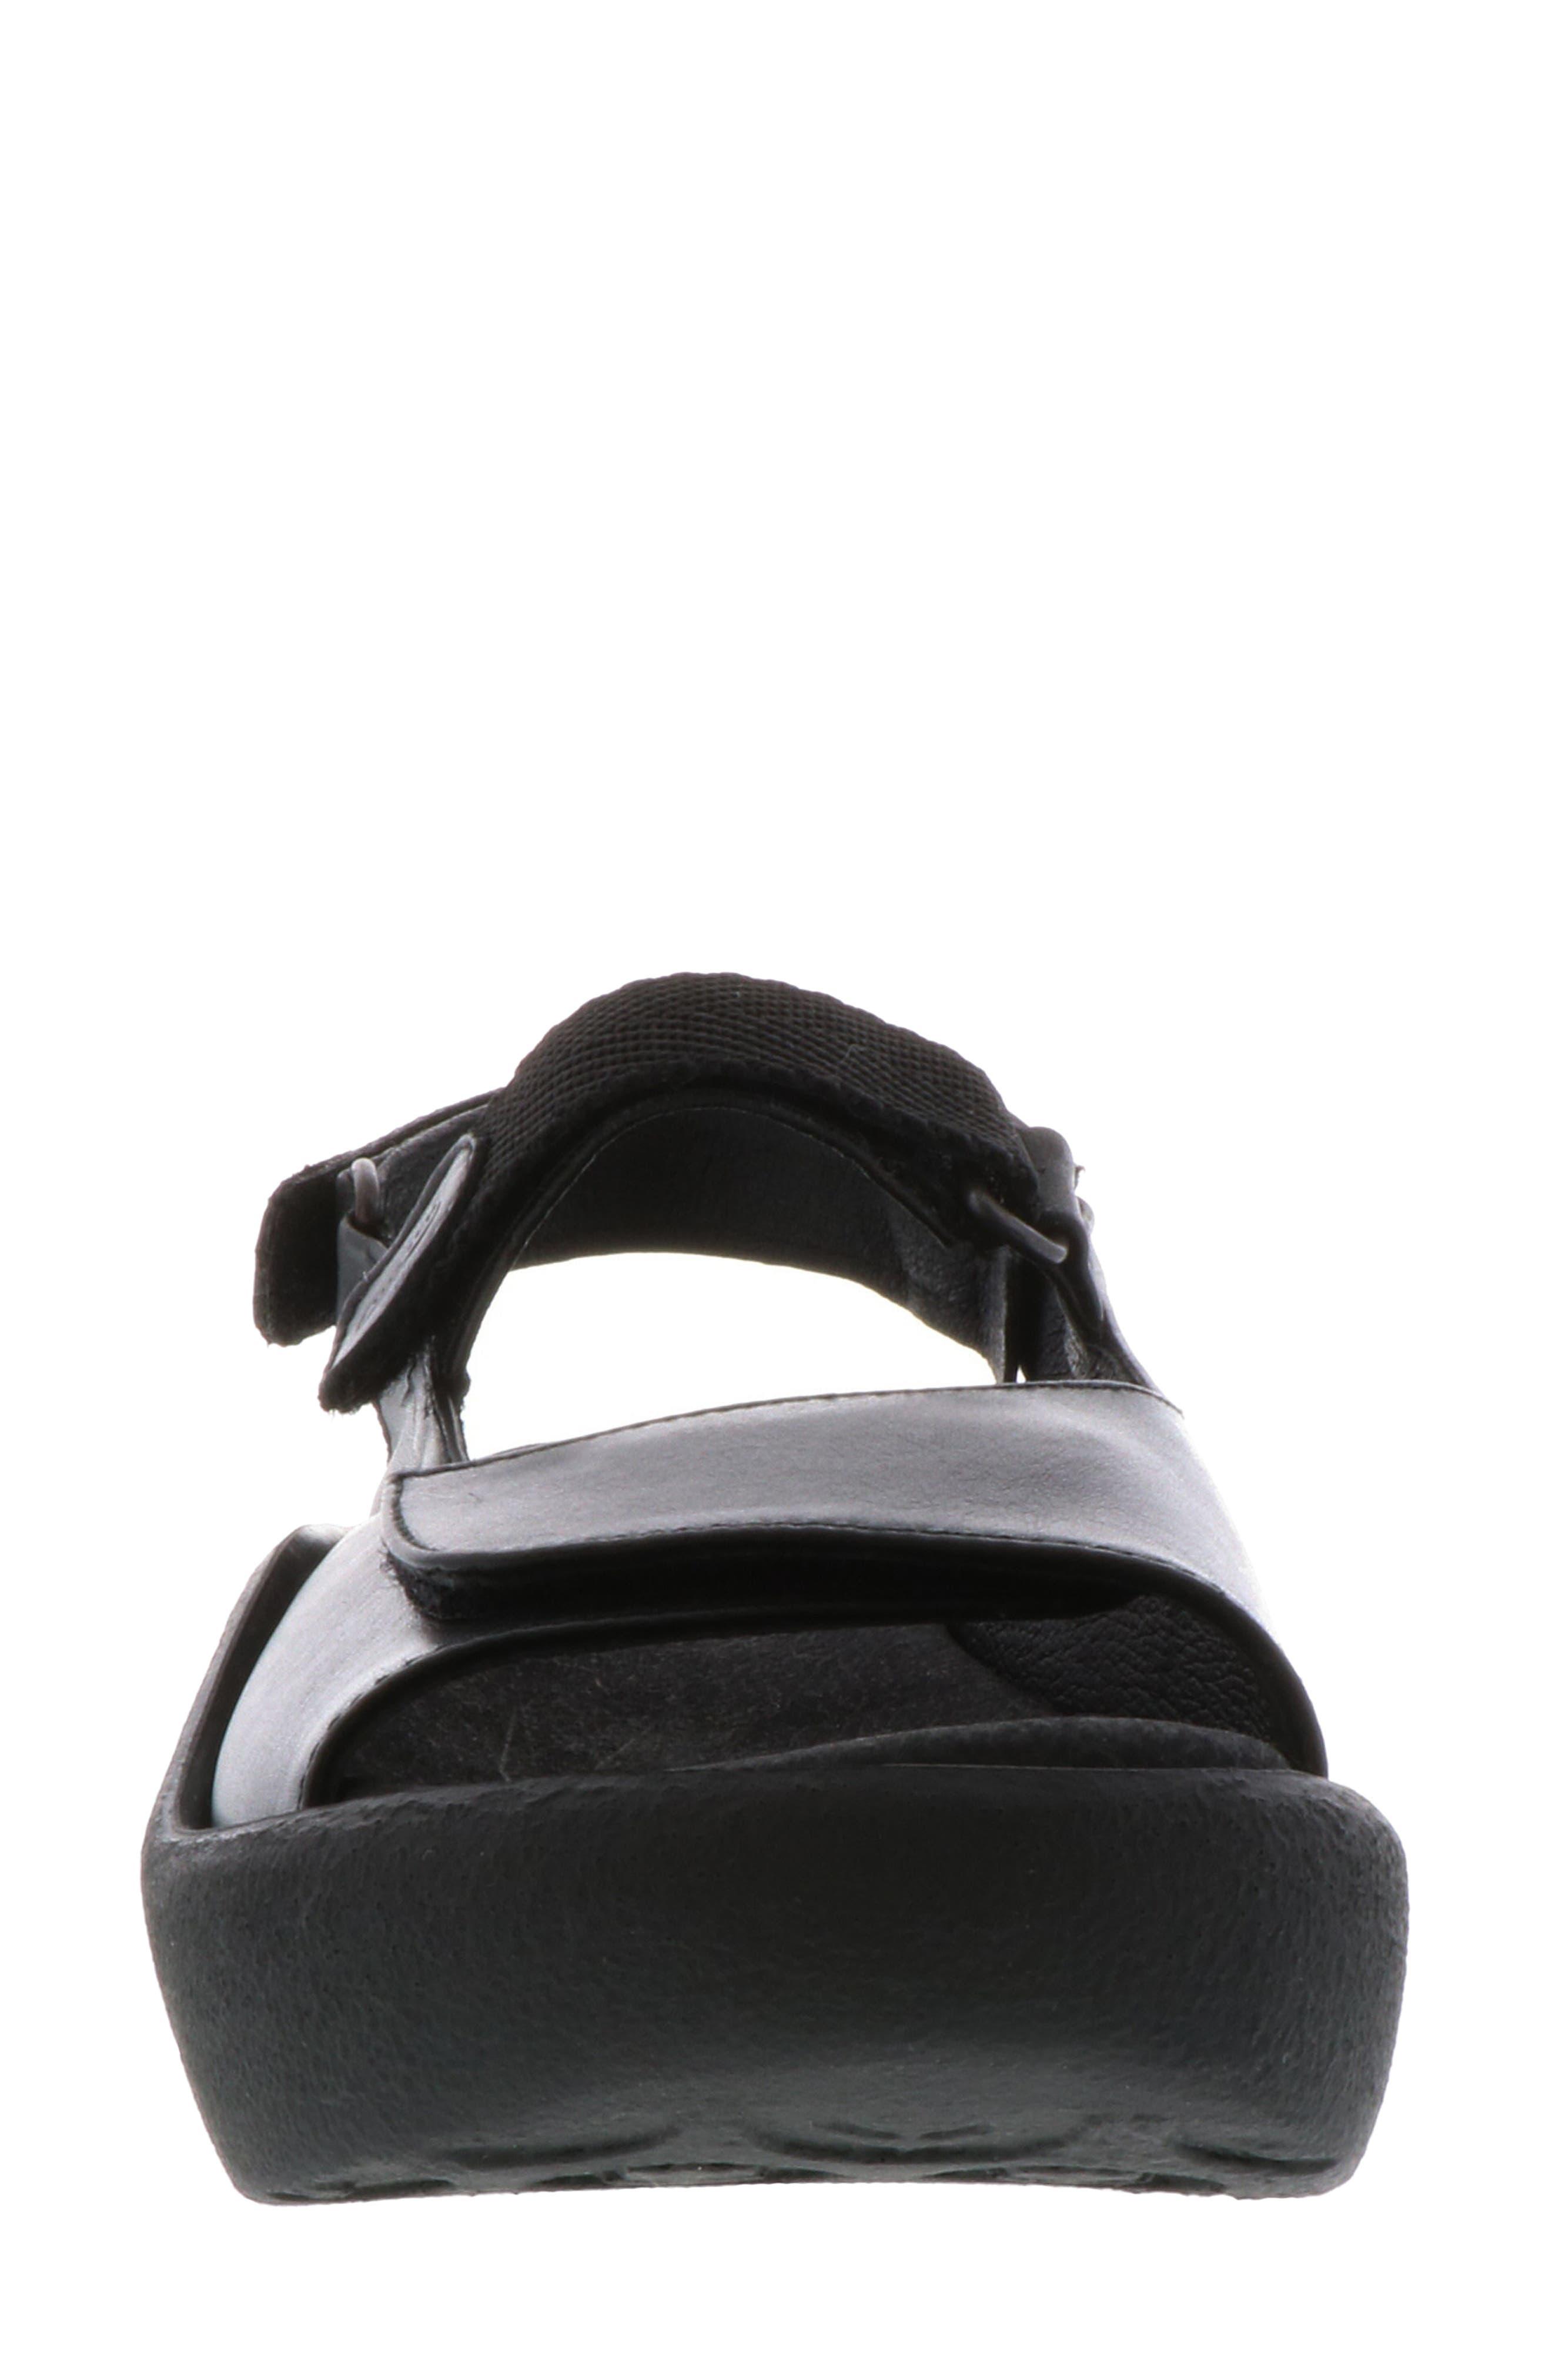 WOLKY, Jewel Sport Sandal, Alternate thumbnail 4, color, BLACK/ BLACK